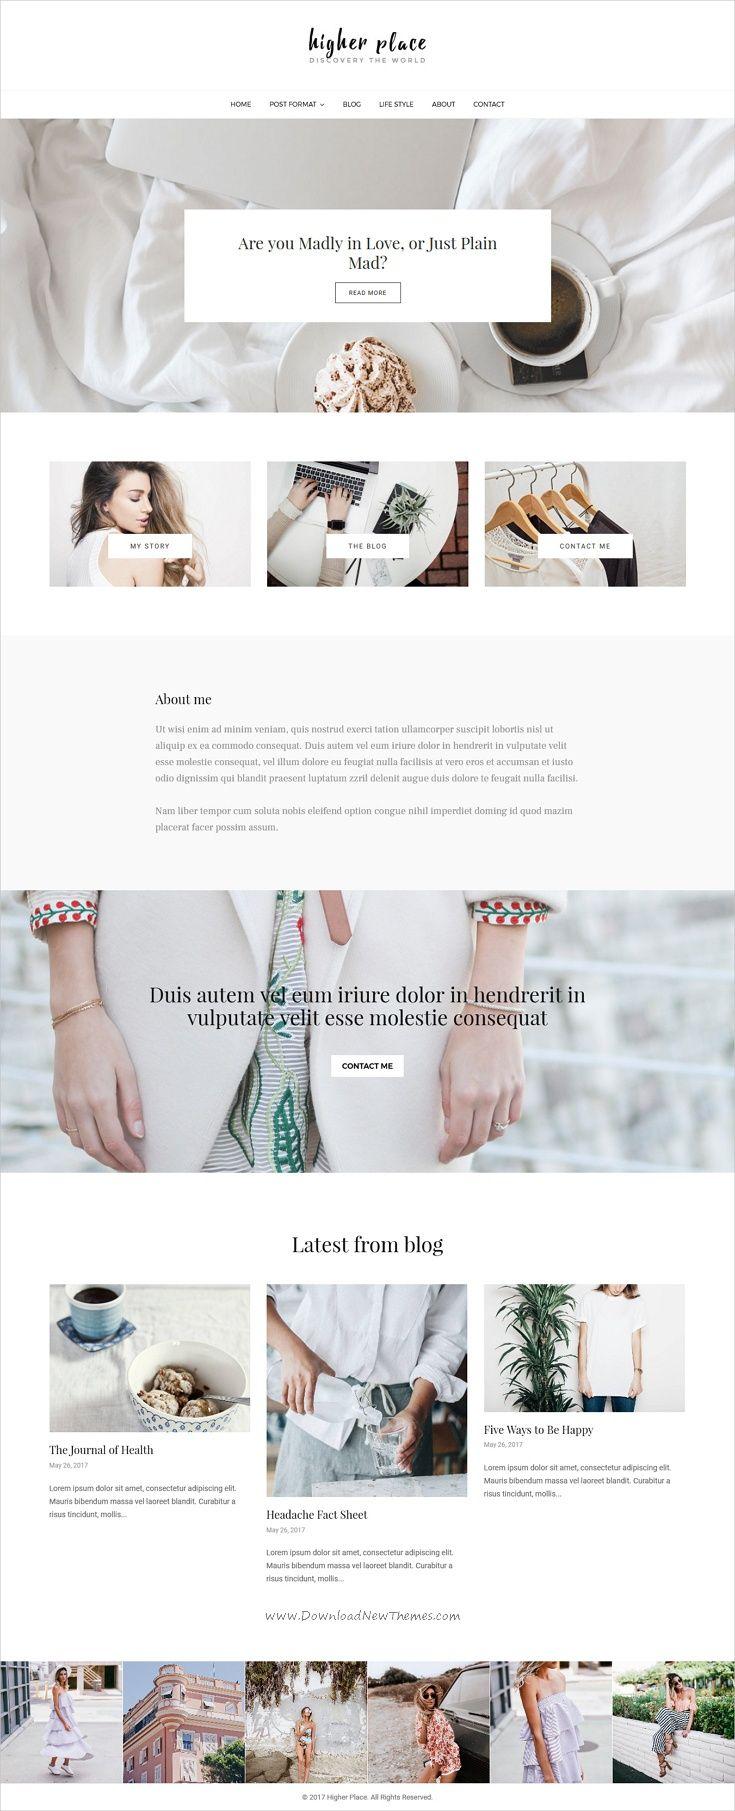 Higher Place - Blog & Magazine WordPress Theme